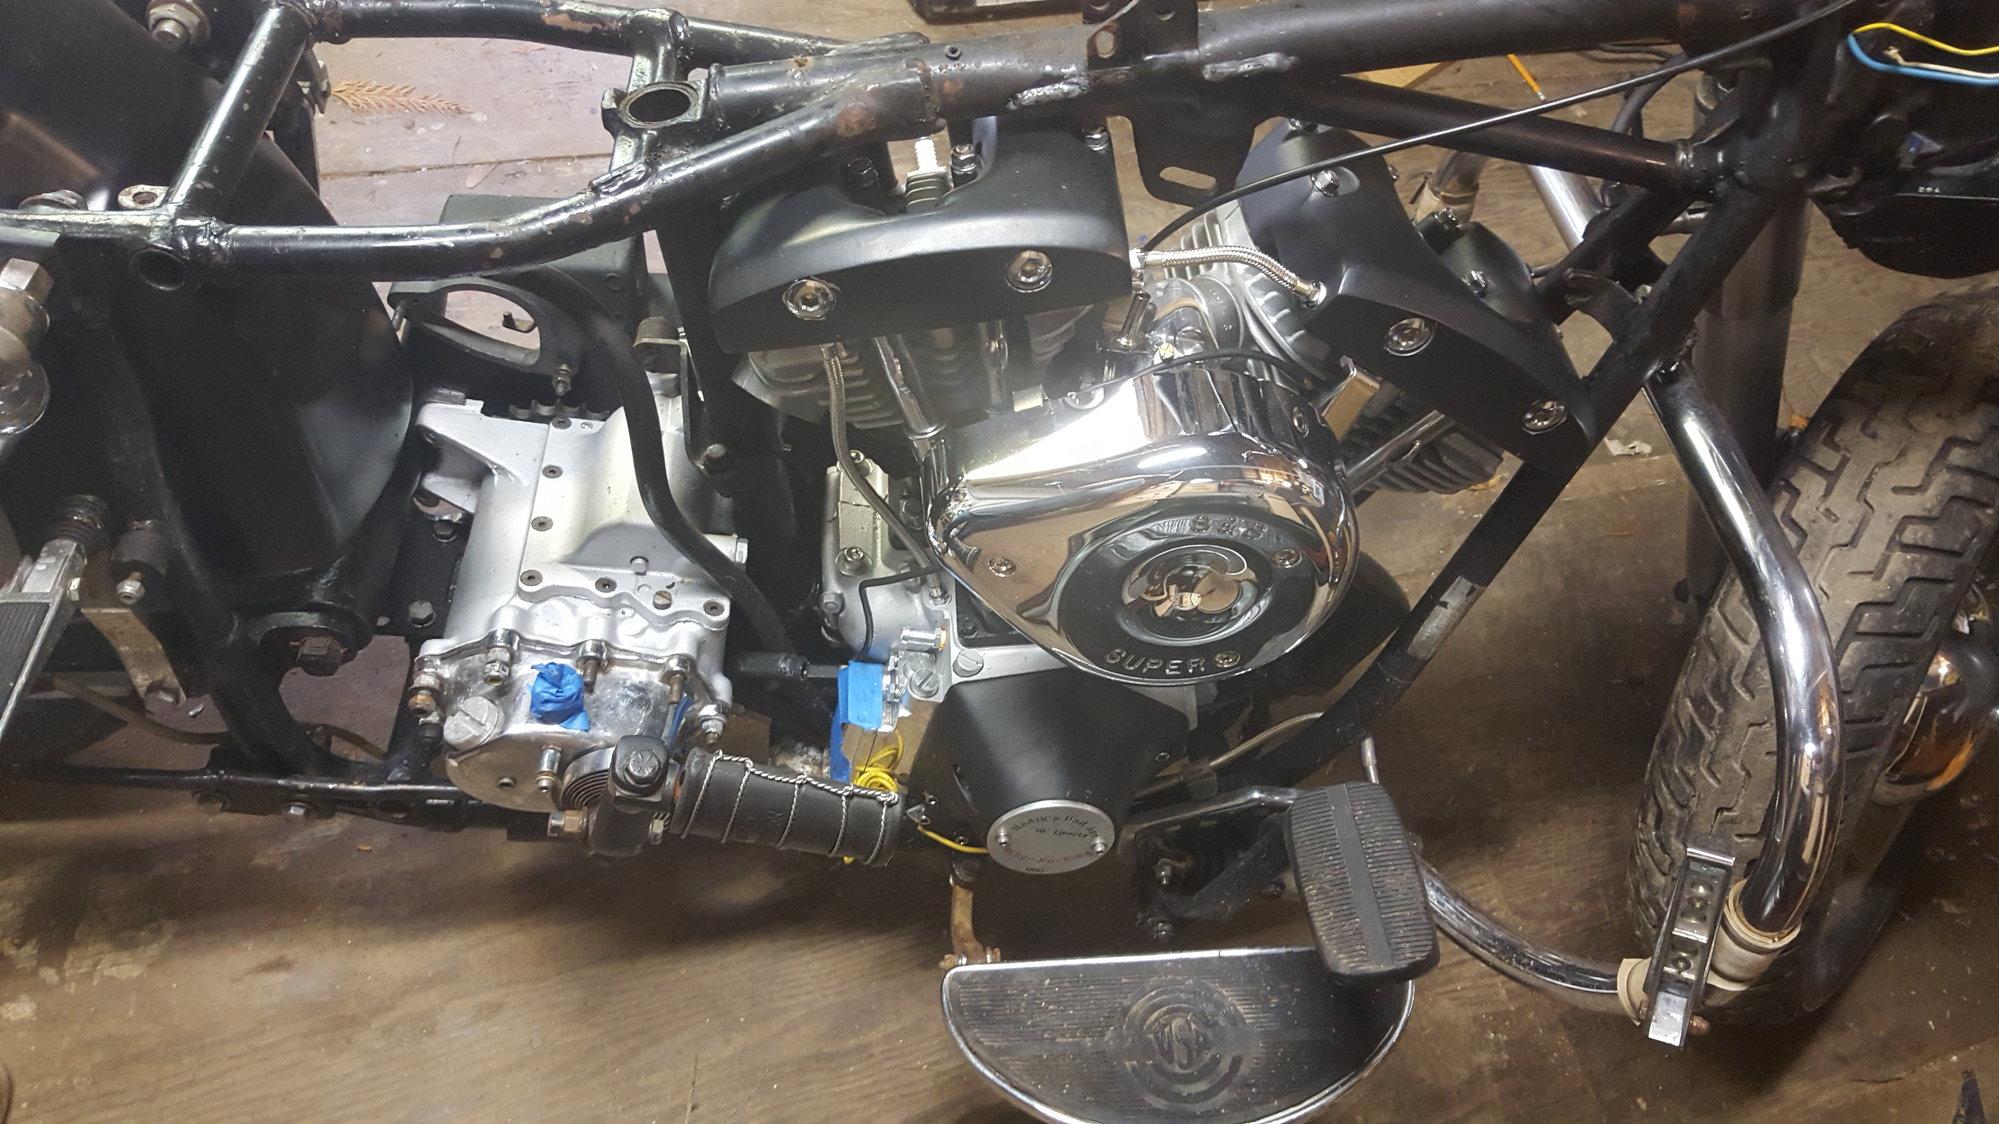 Wiring Diagram Additionally Shovelhead Wiring Diagram On Harley